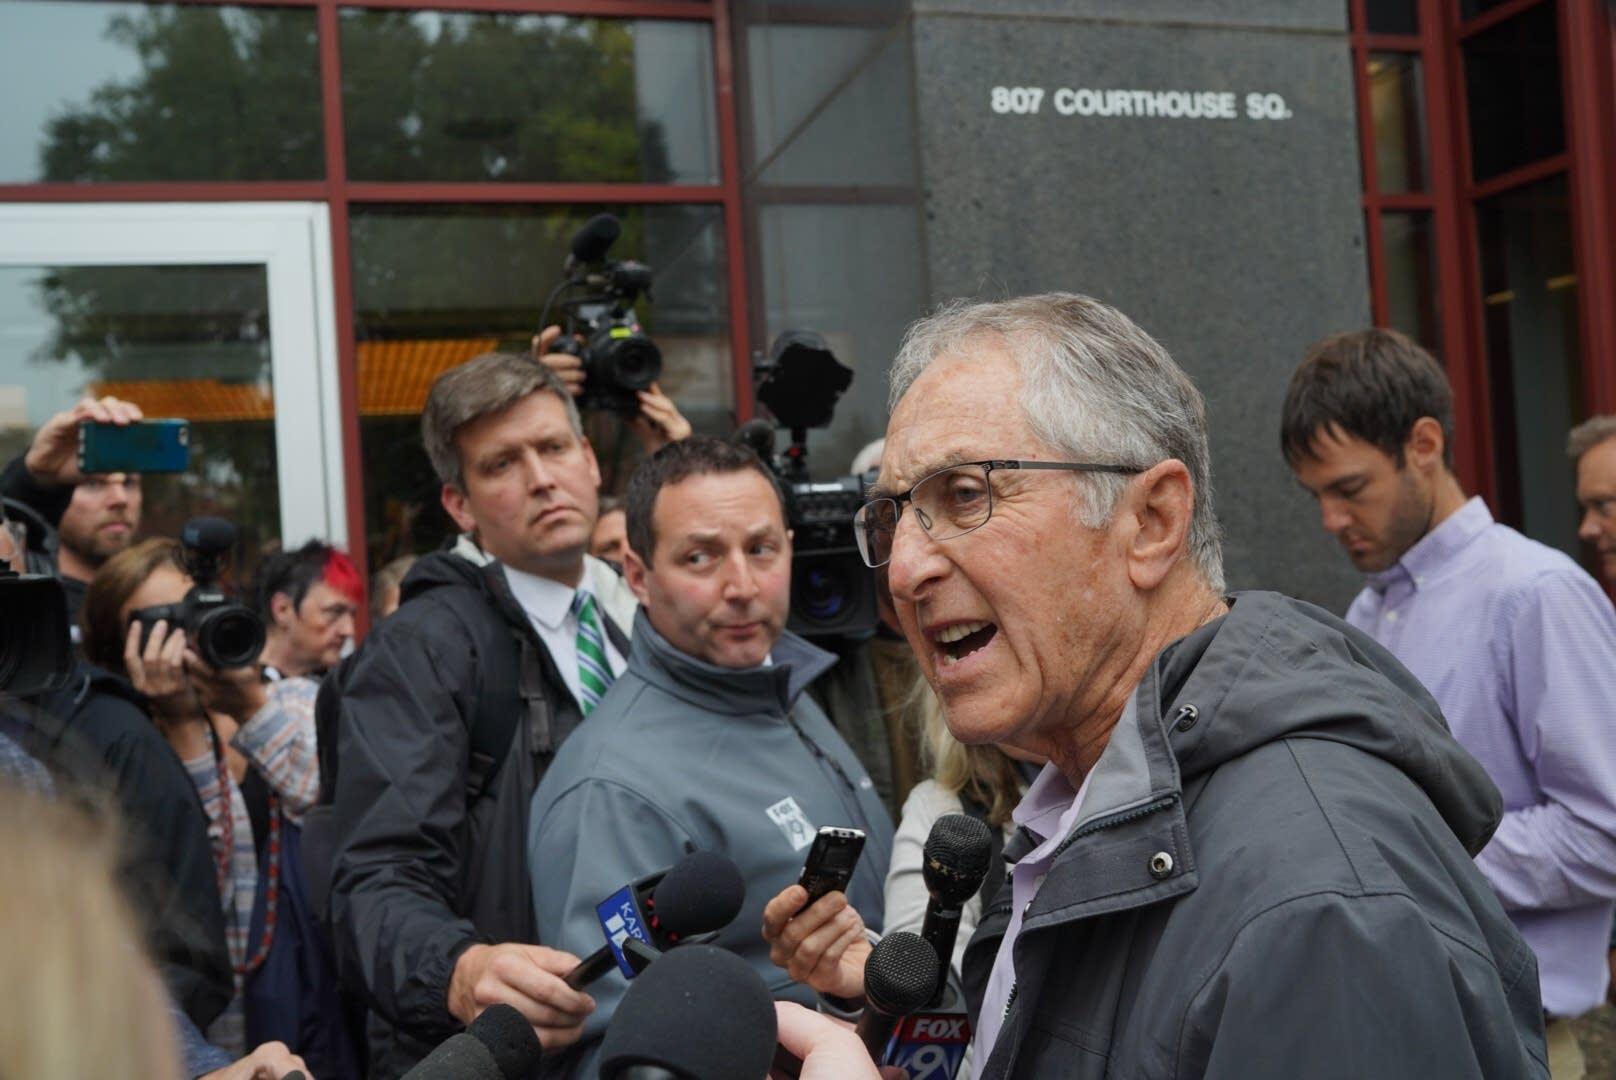 Former FBI agent Al Garber rebuffed criticism of investigation